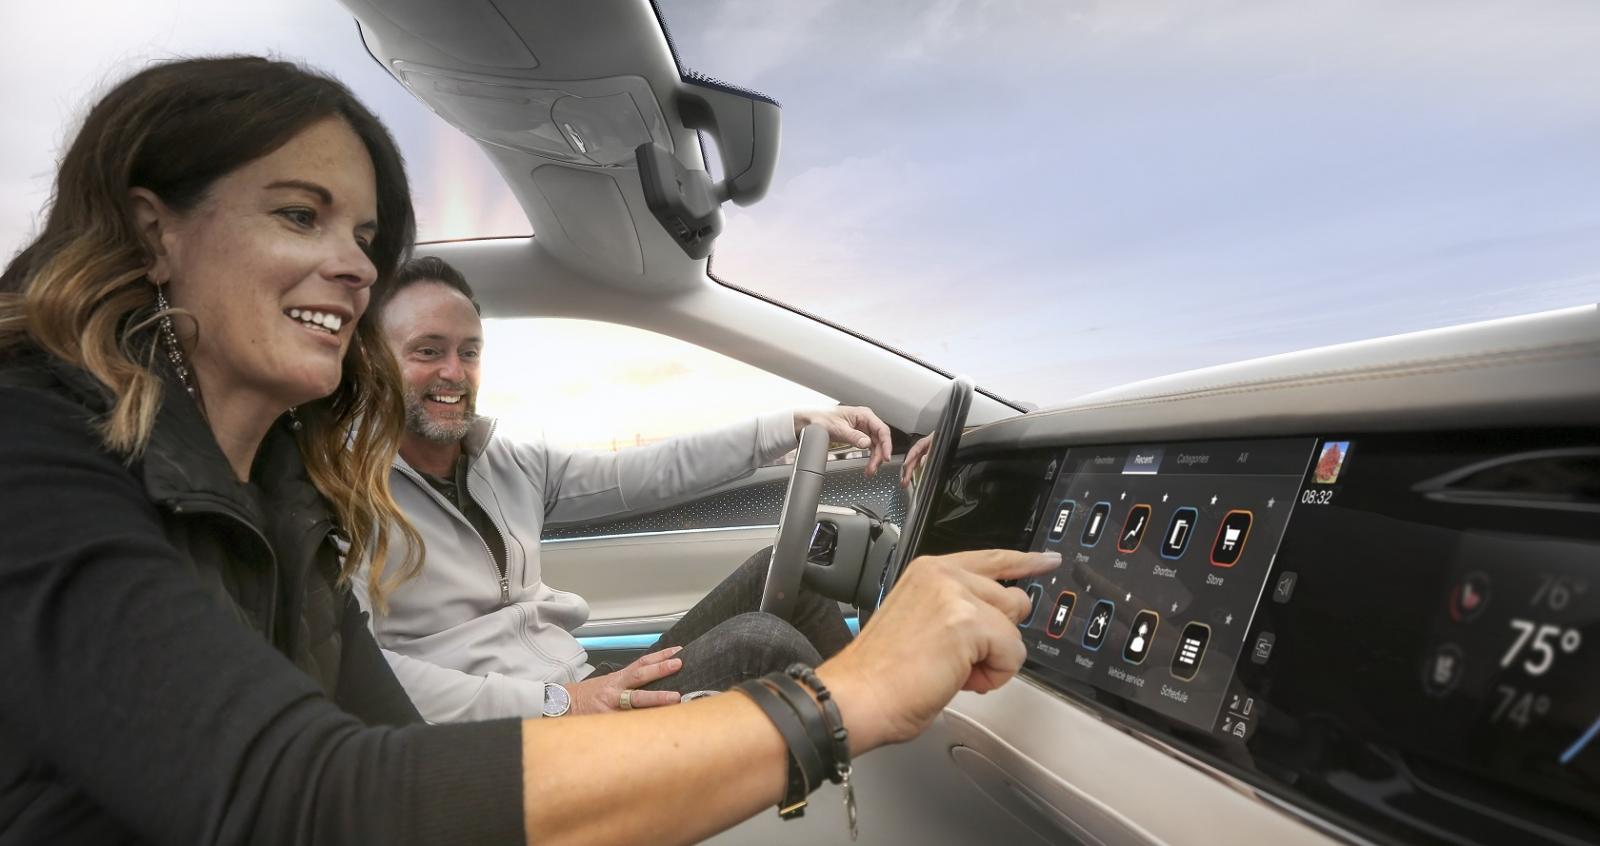 Mobile Drive de Stellantis y Foxconn